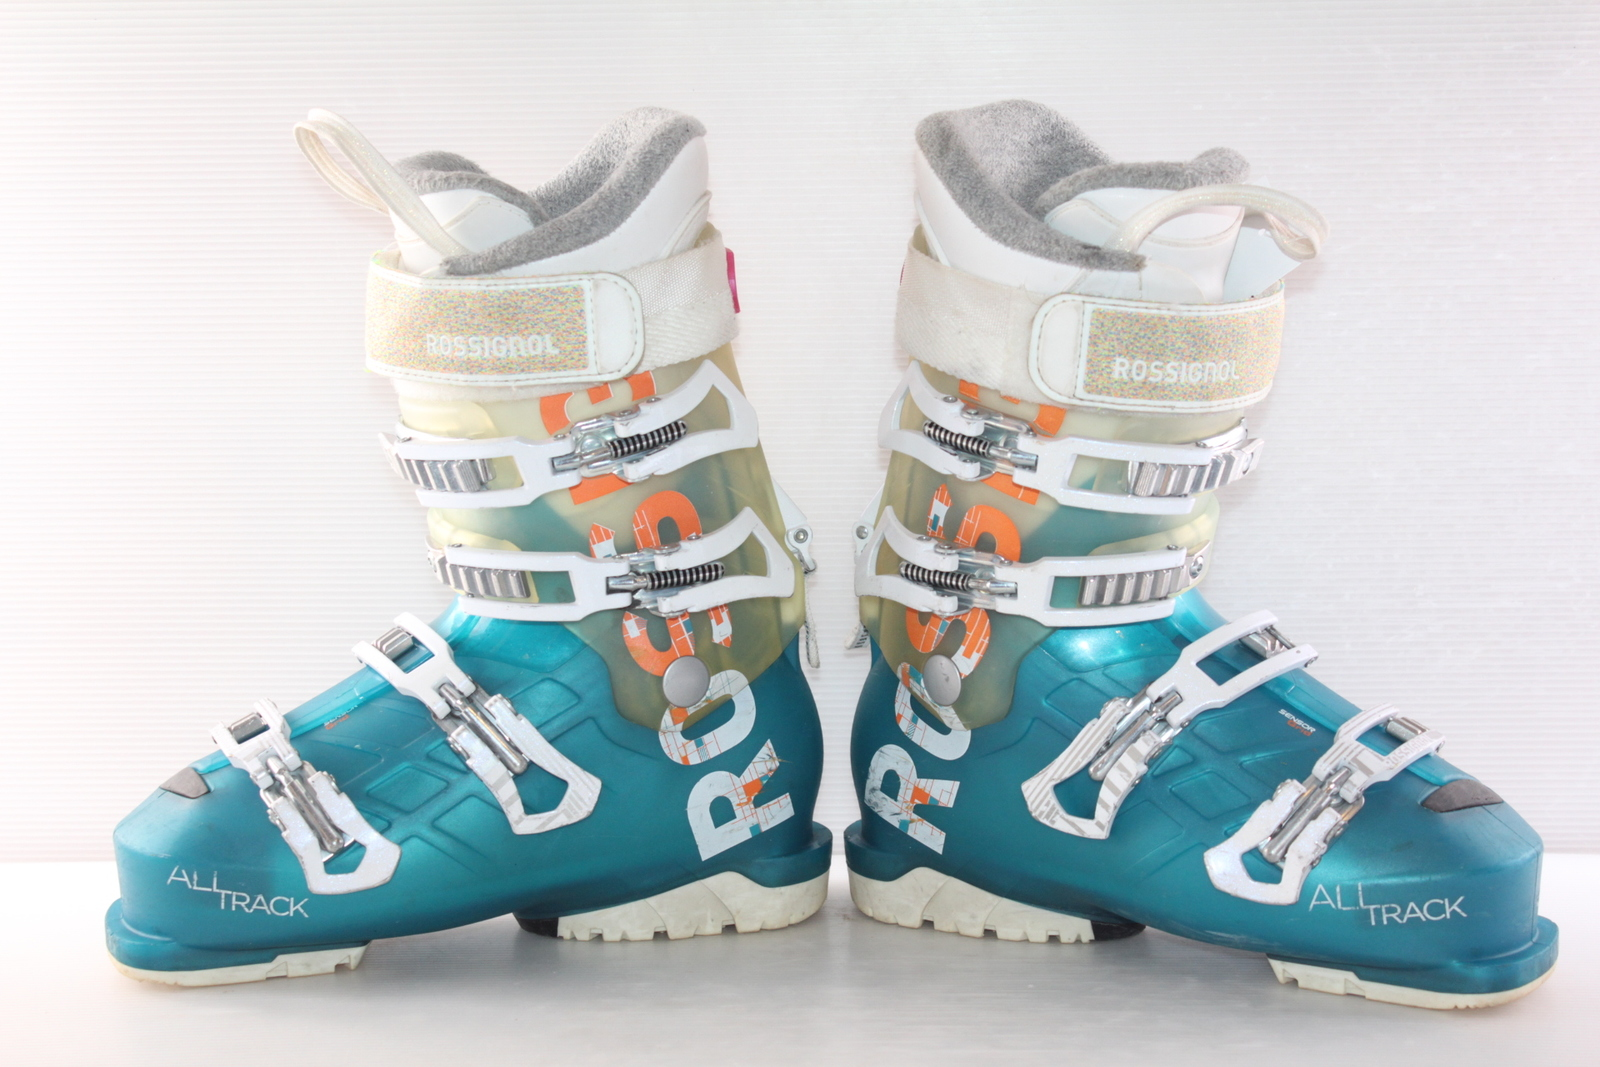 Dámské lyžáky Rossignol All Track vel. EU38.5